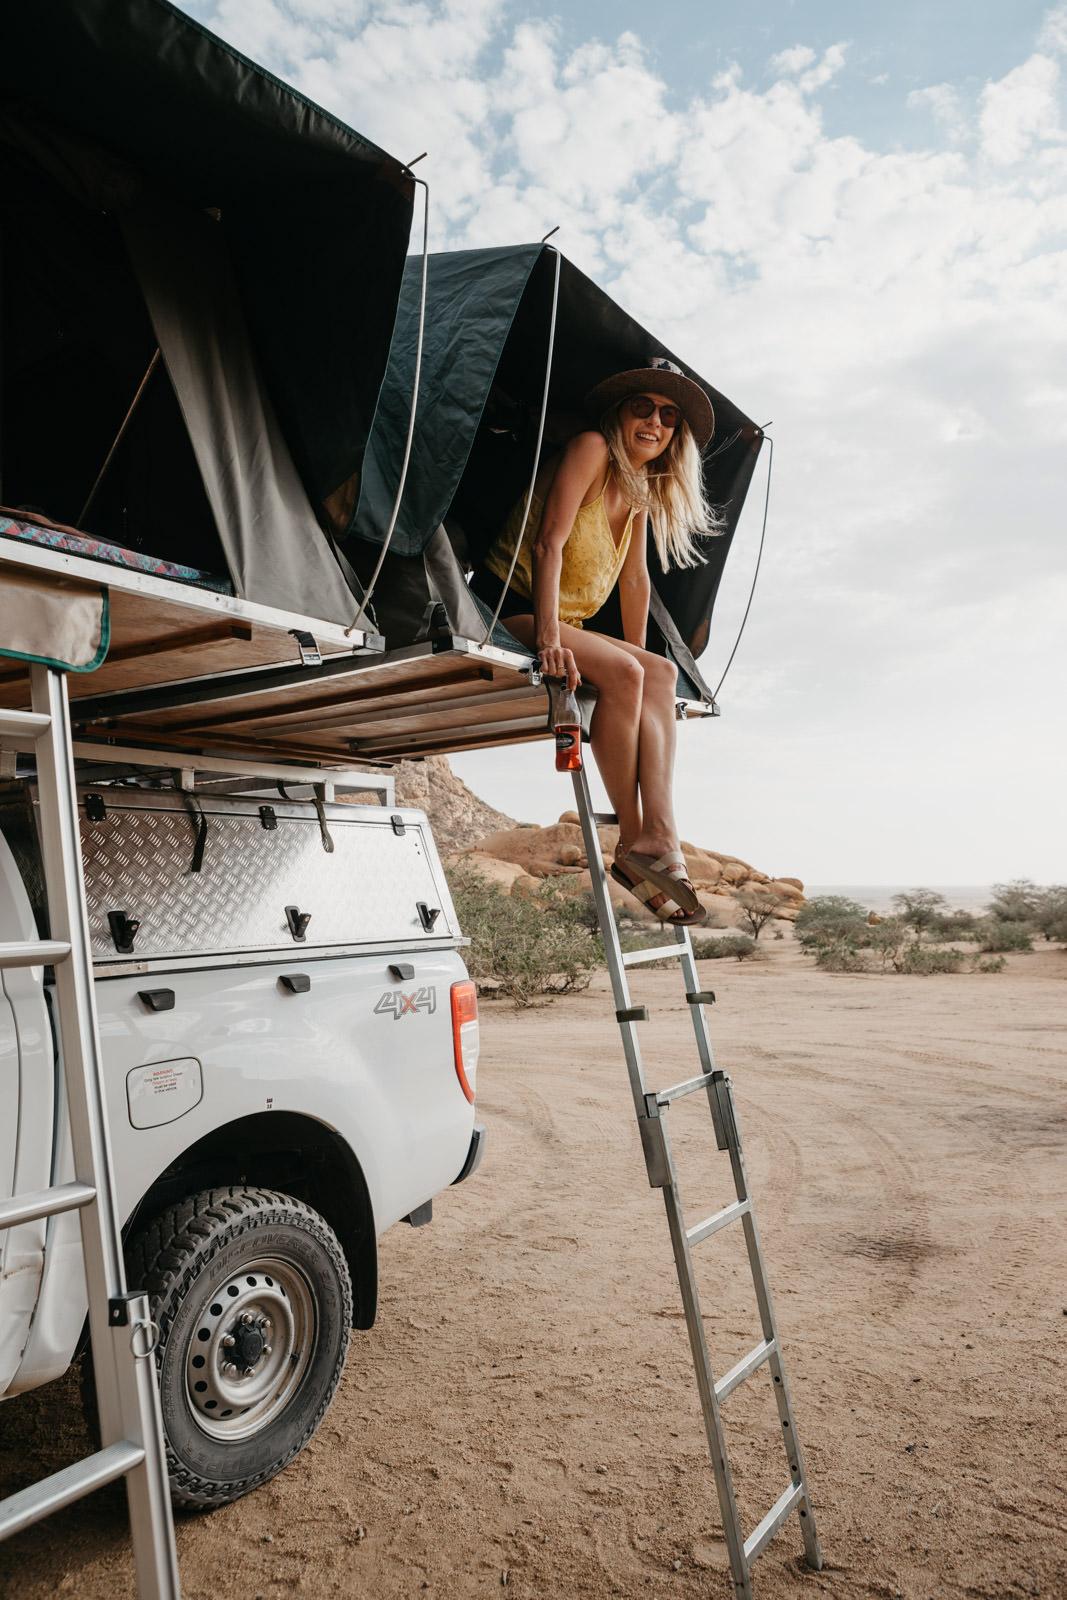 namibia_trip_rooftent_camping_roadtrip (8 von 18).jpg